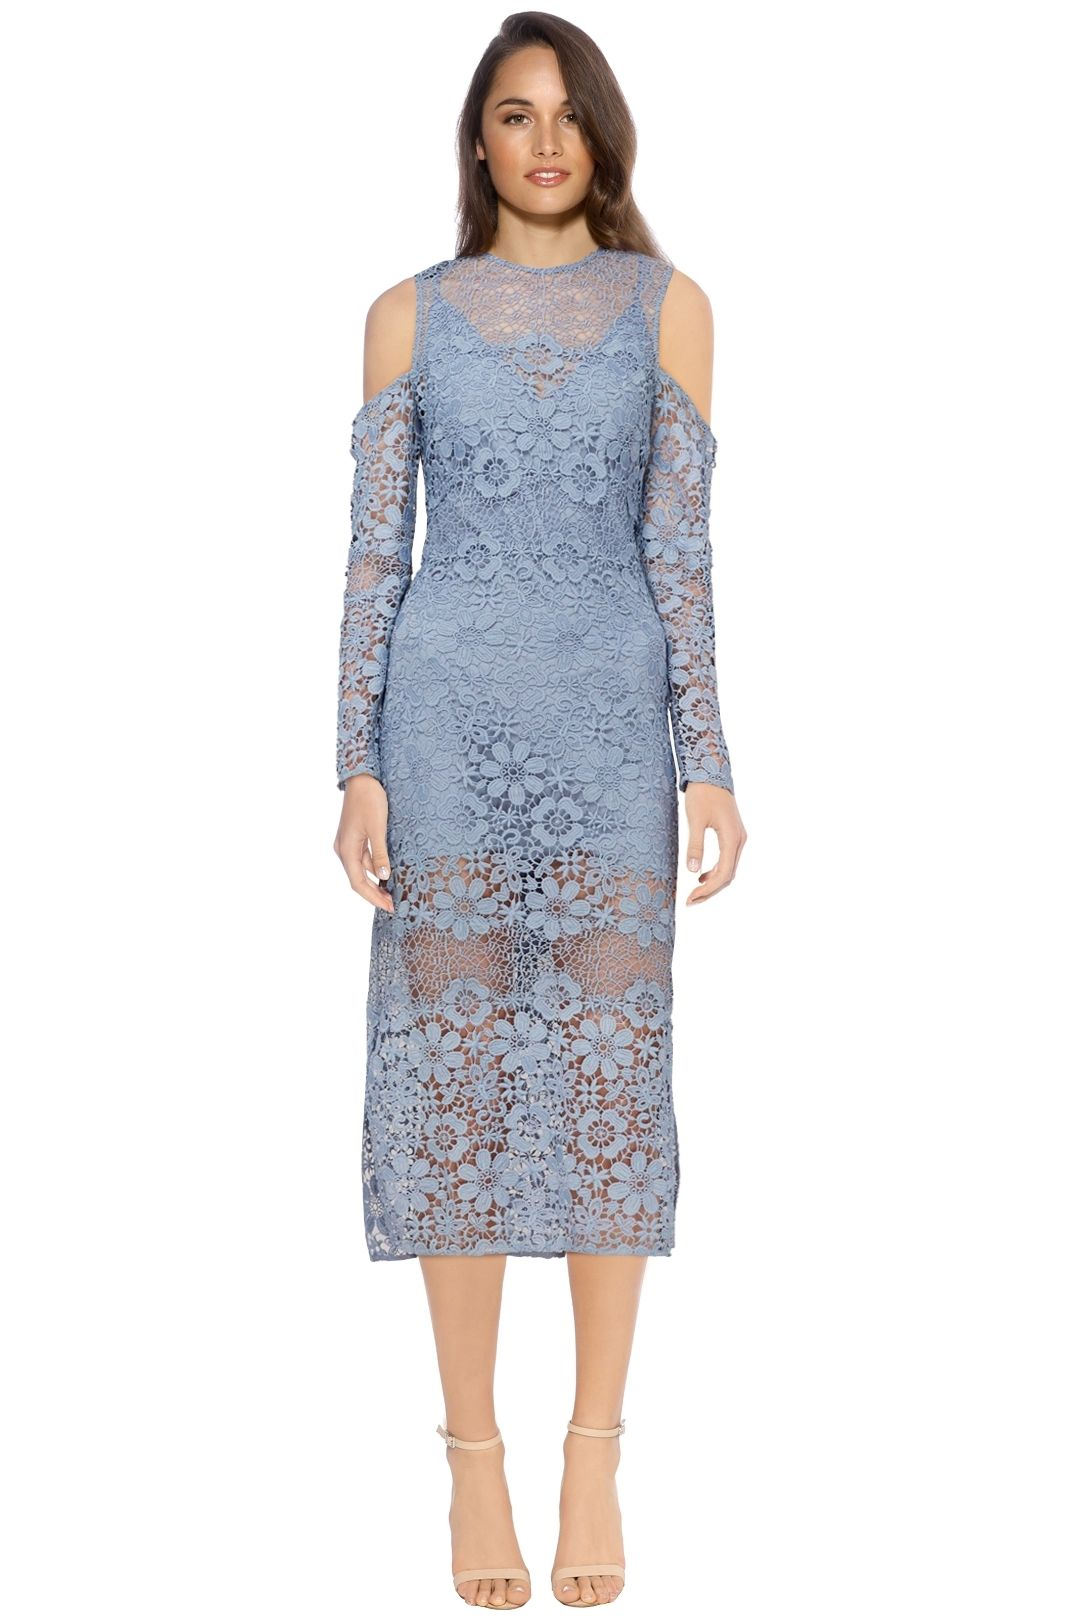 Keepsake The Label - Reach Out LS Midi Dress Steel - Blue - Front